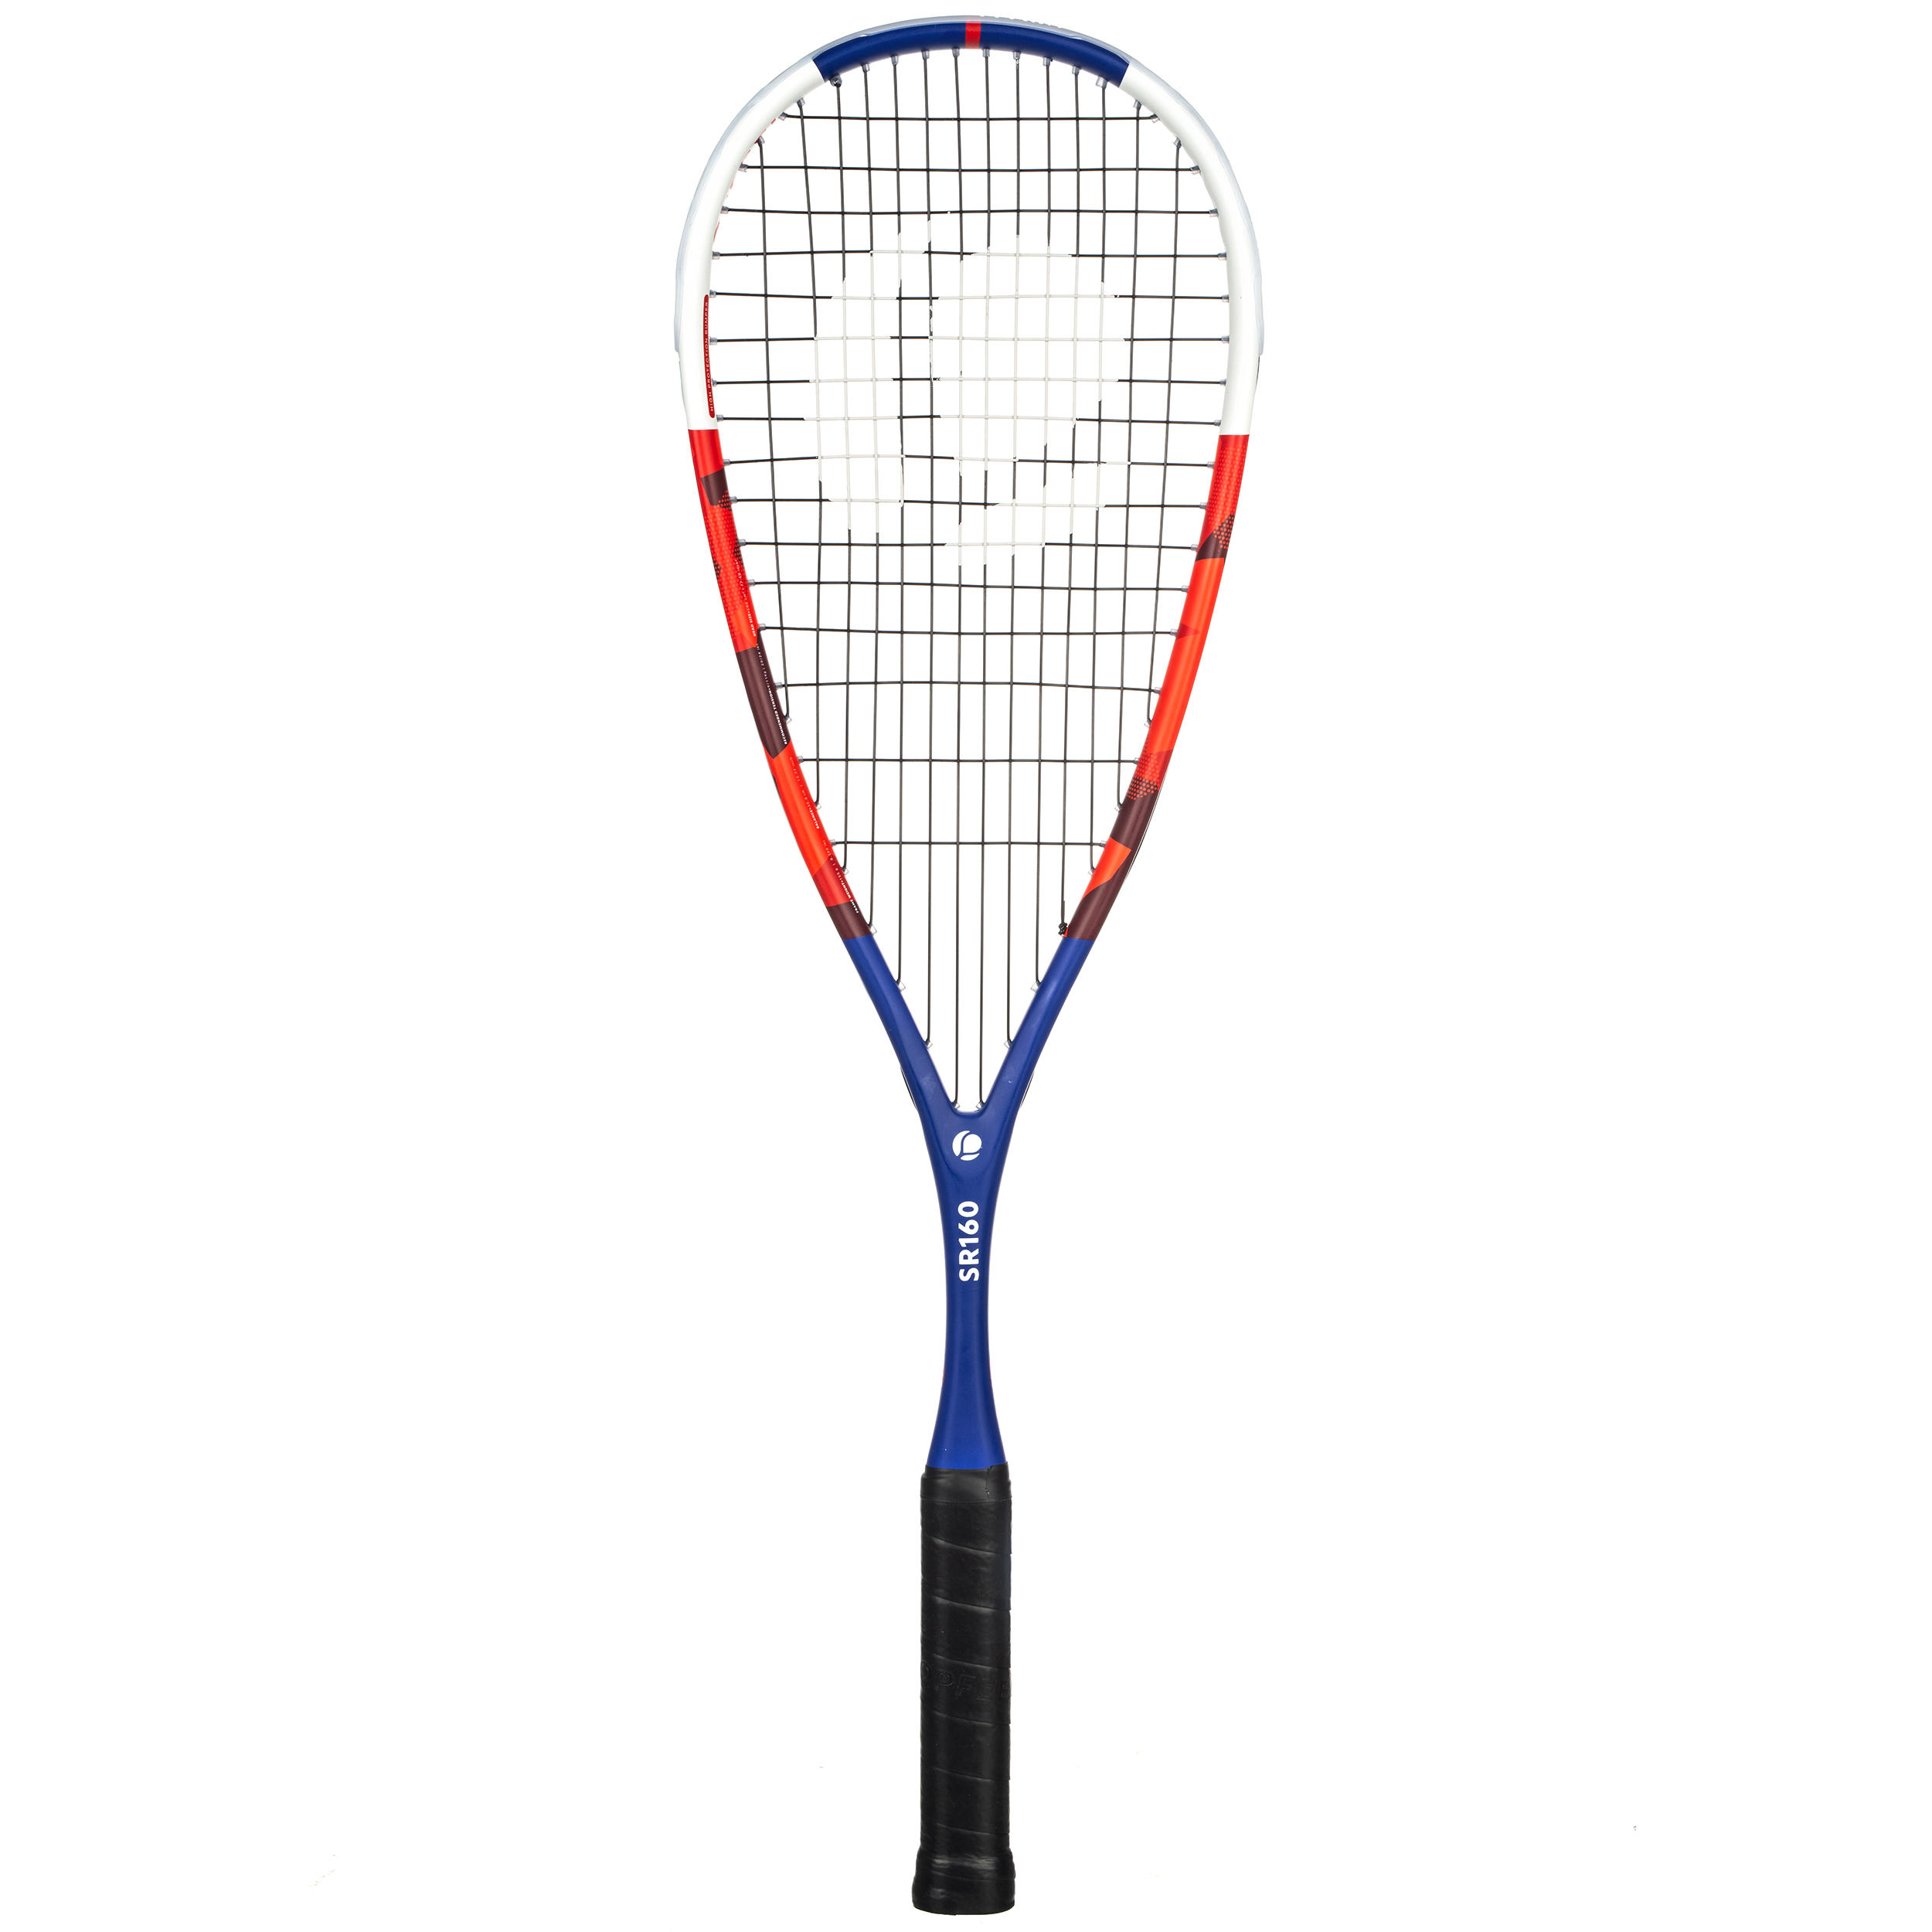 Rachetă Squash SR 160